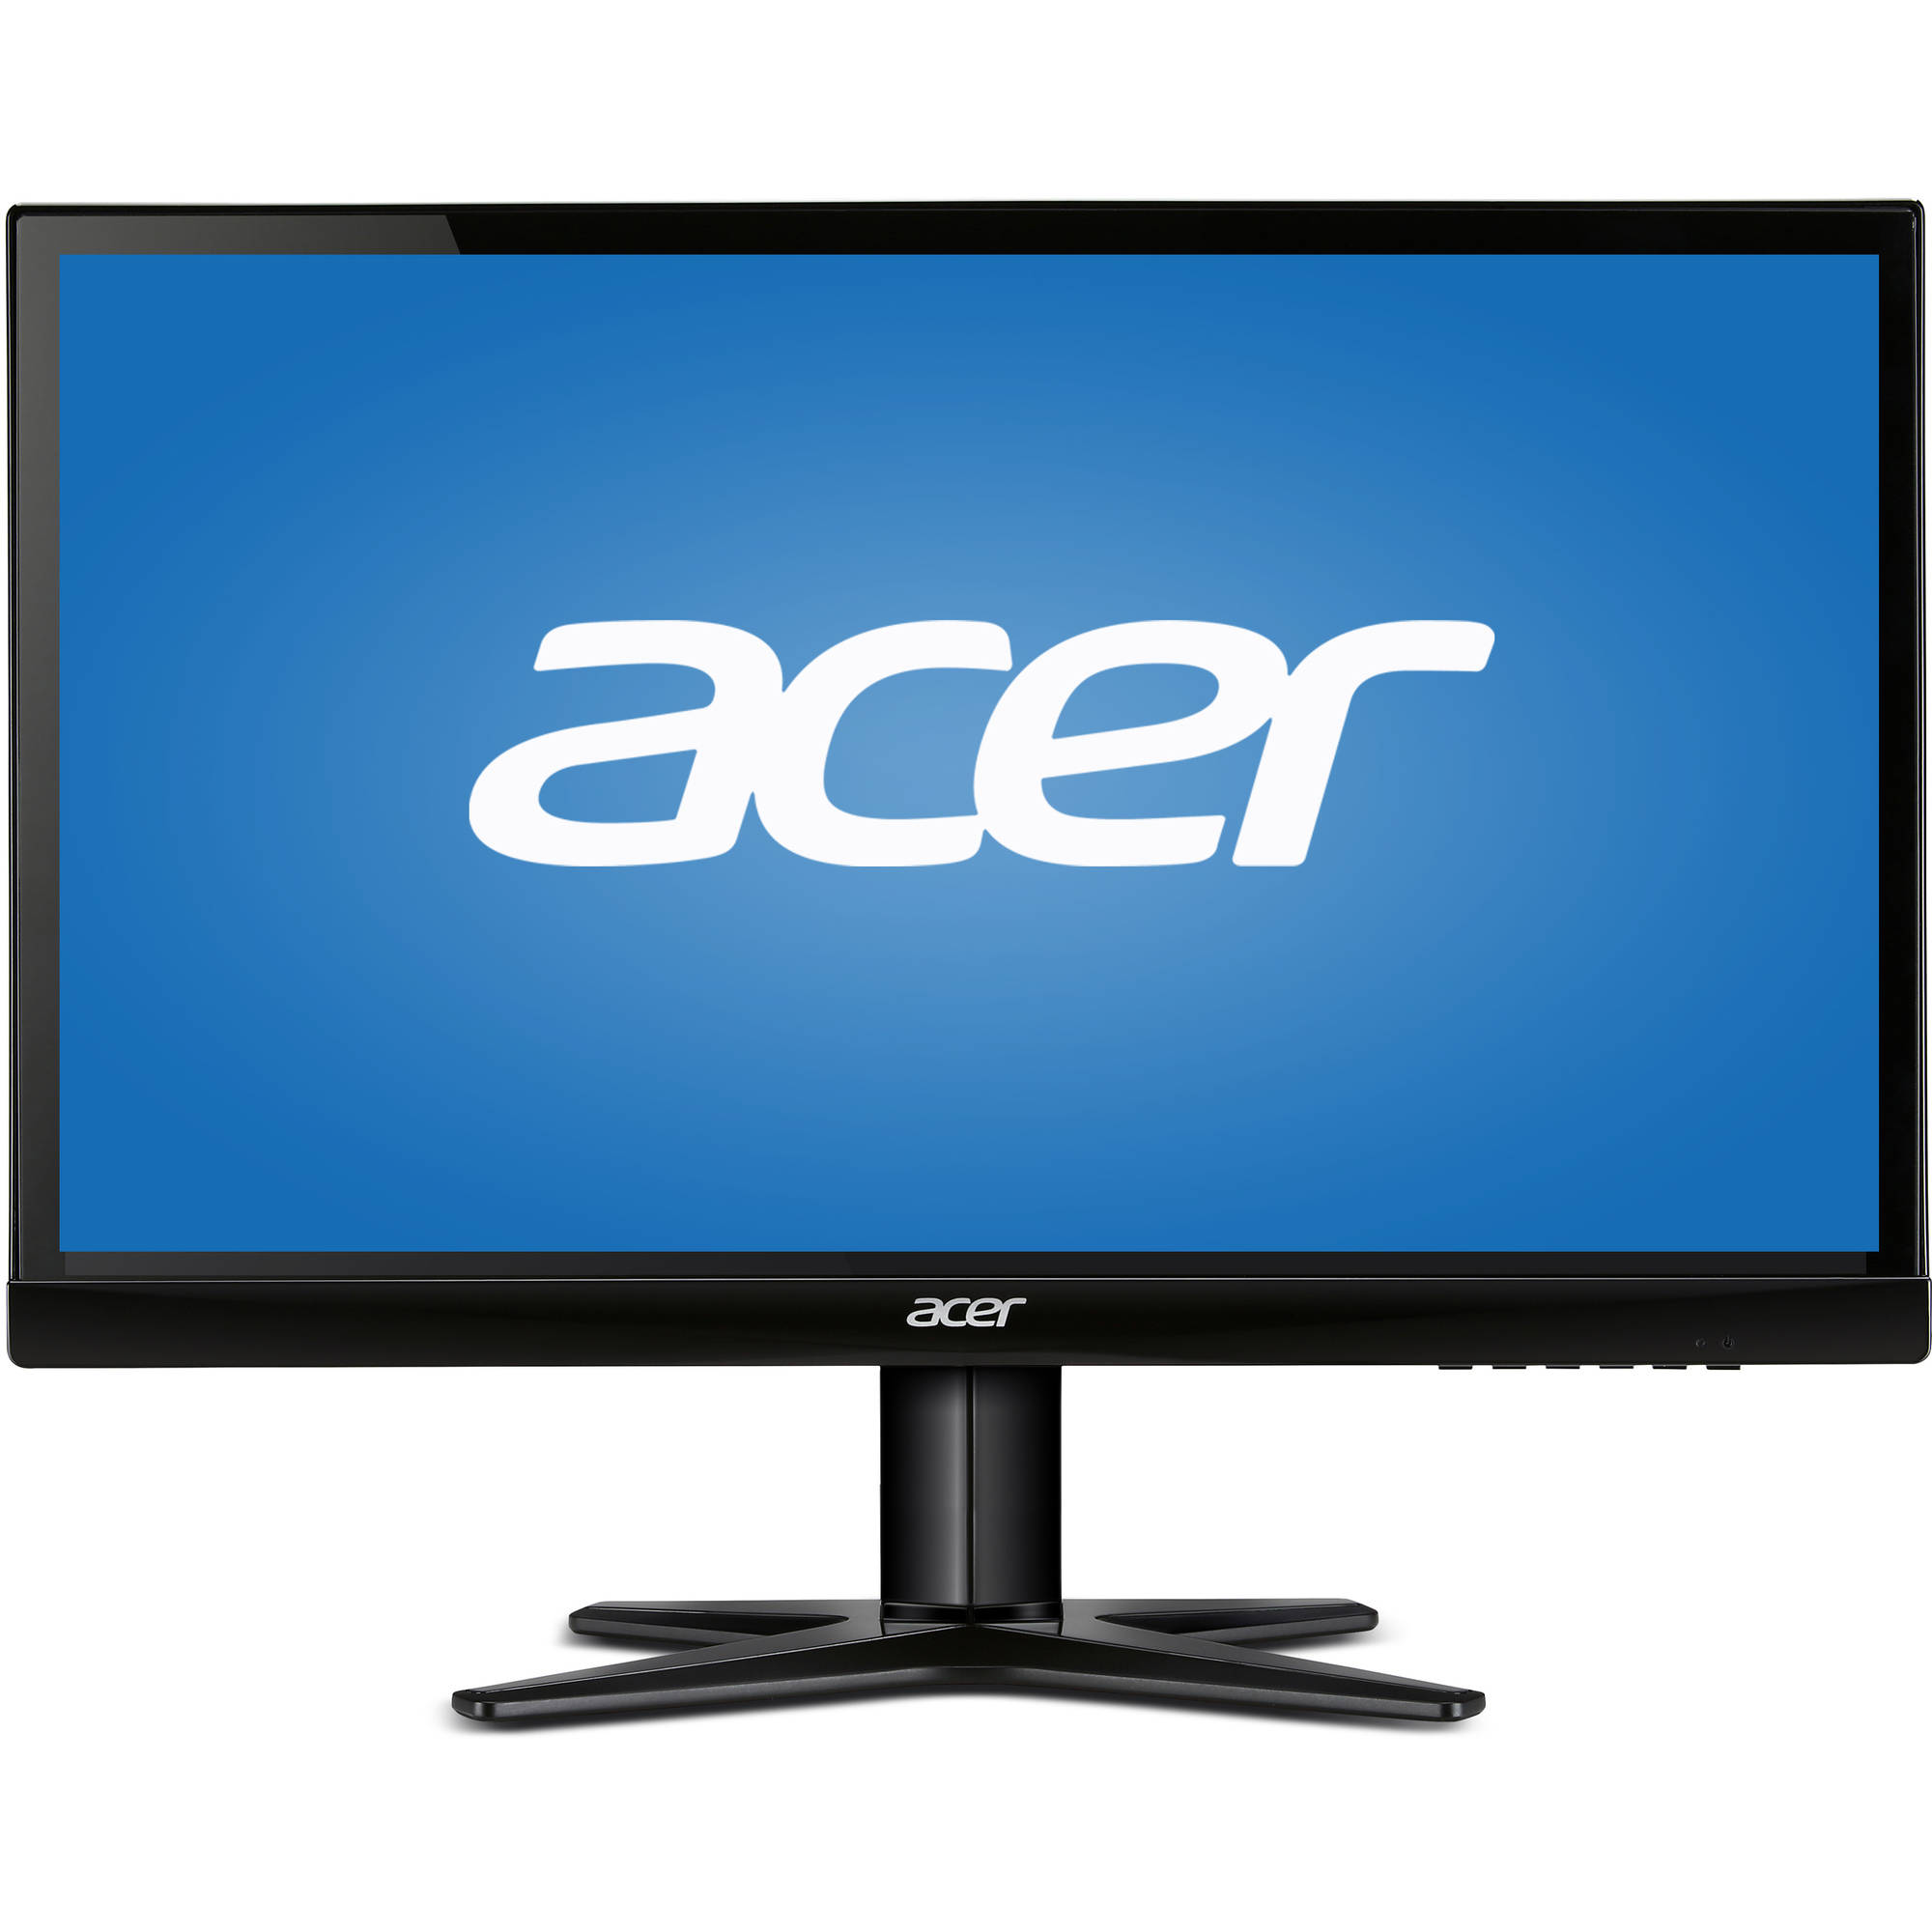 "Acer 21.5"" Widescreen LCD Monitor (G227HQL Abi Black)"